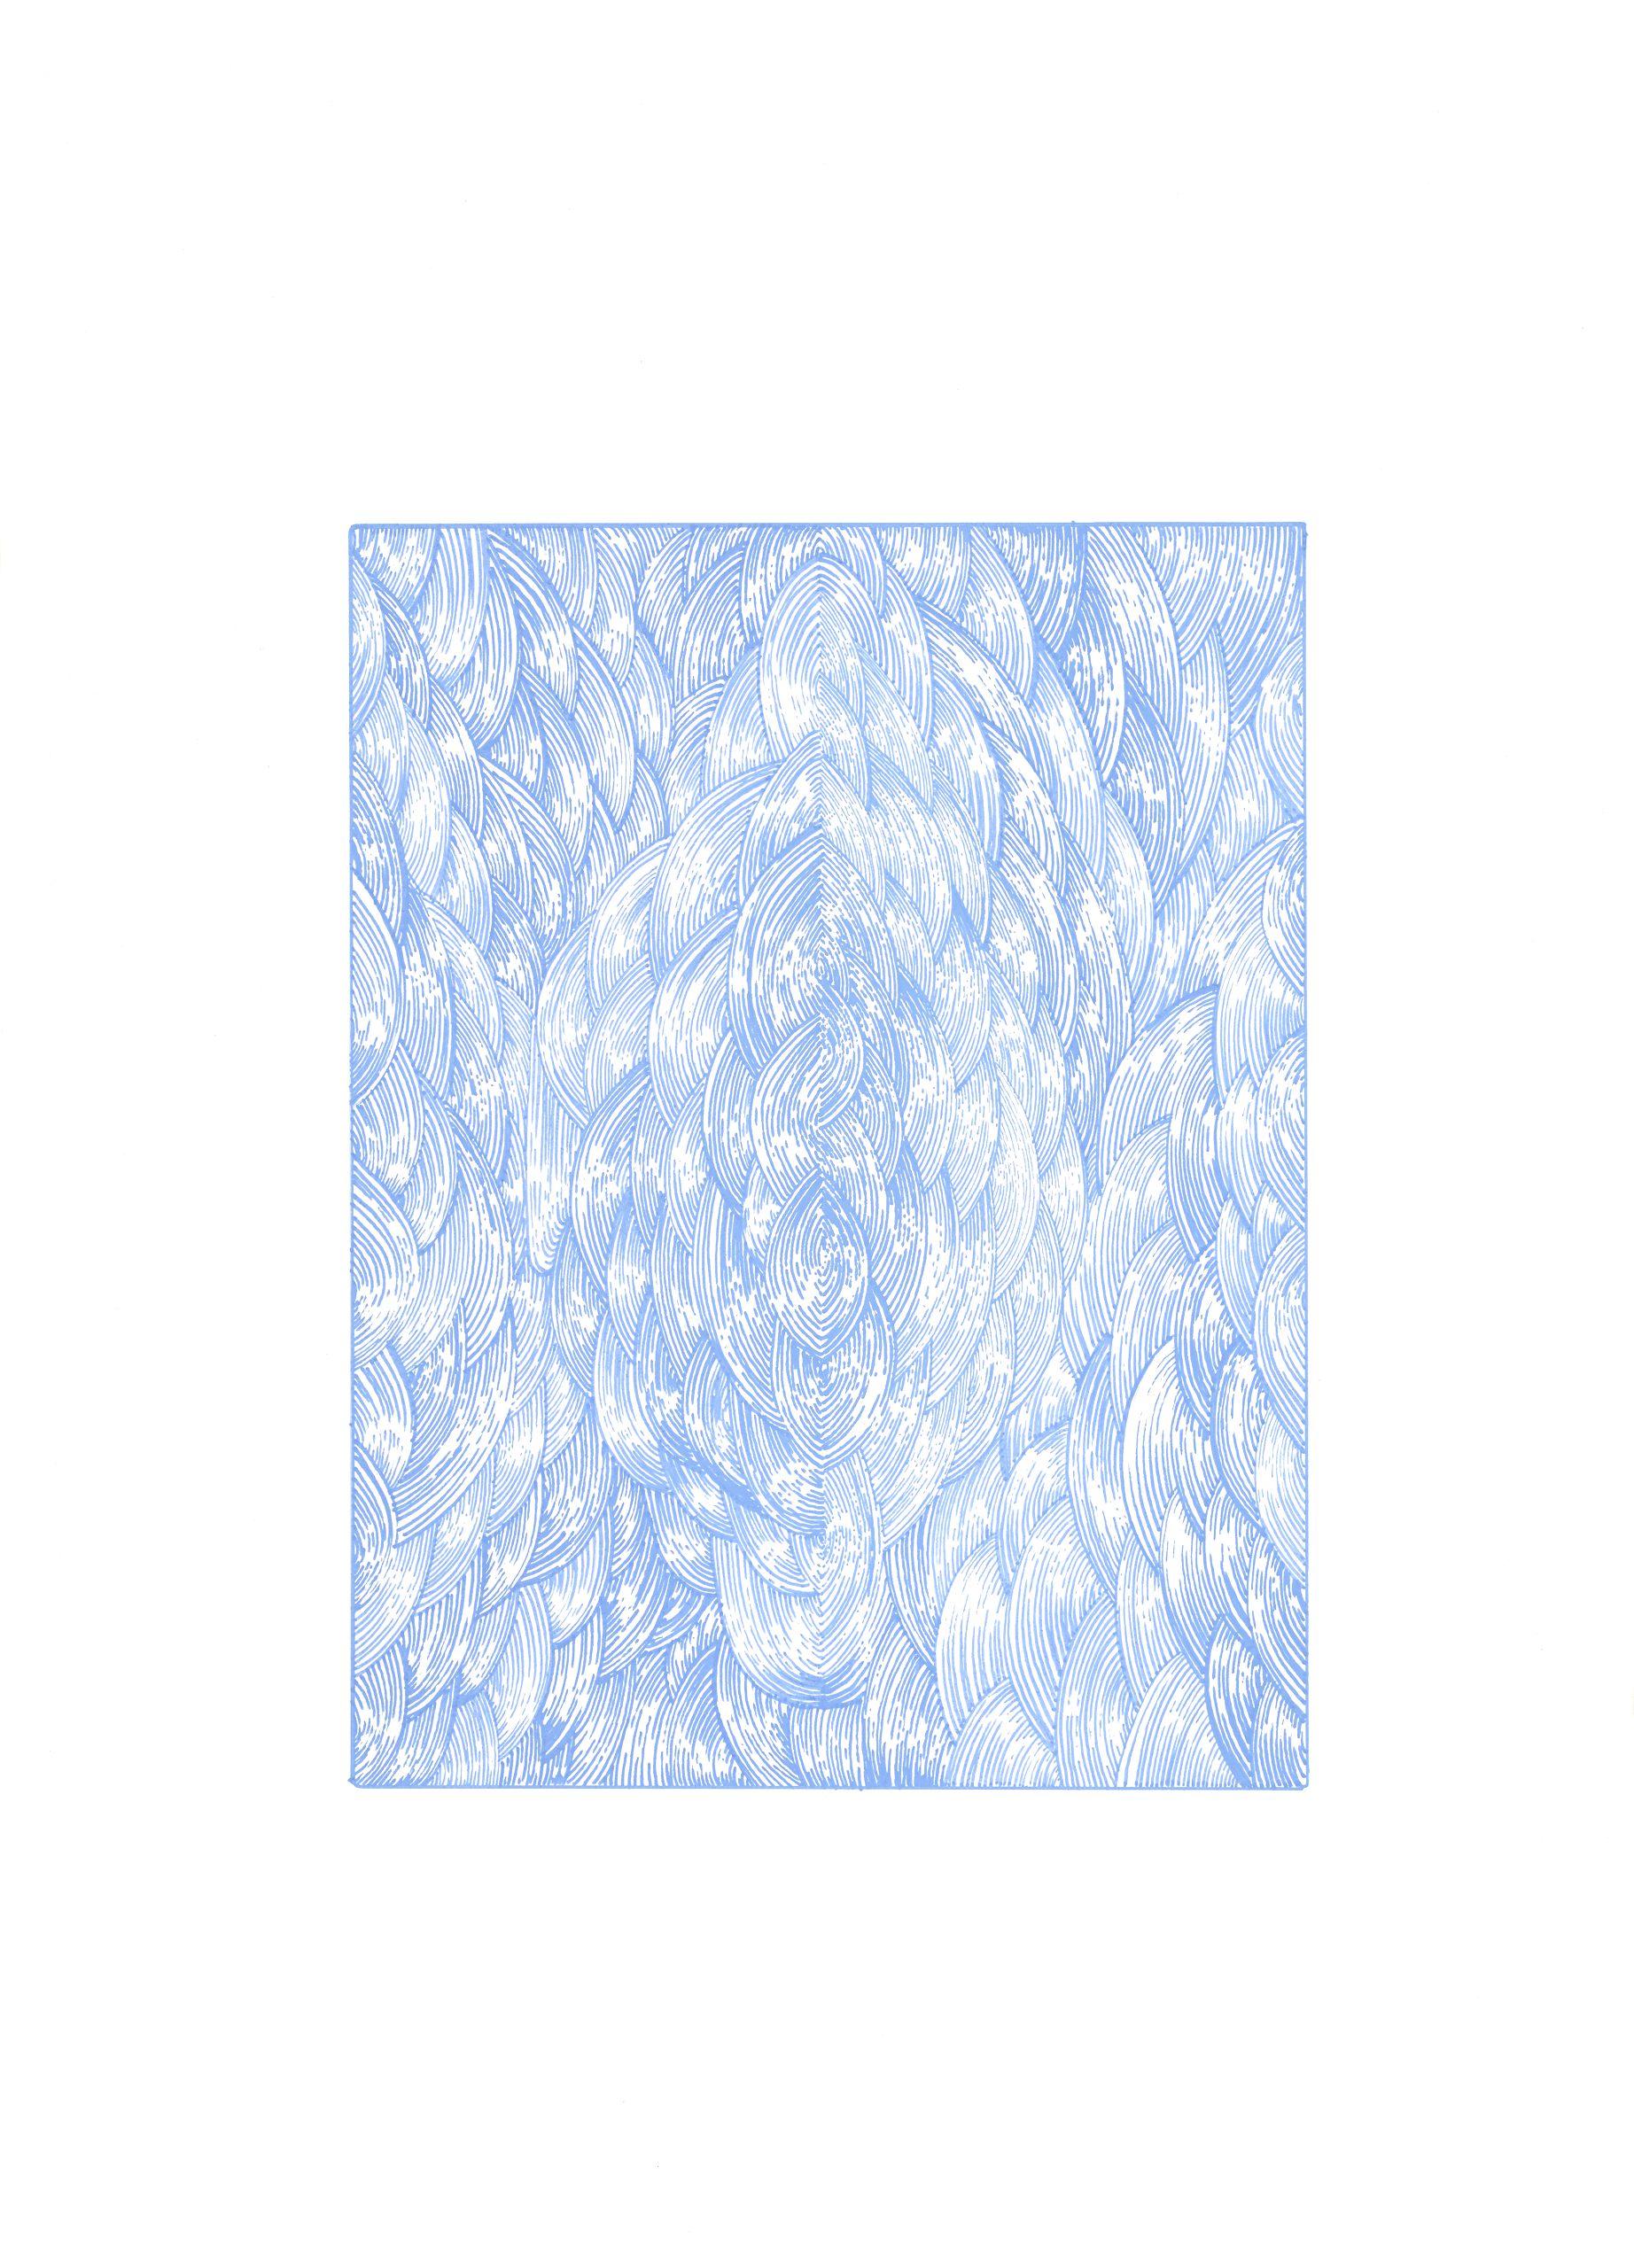 BK P155 | untitled | blue acrylic on paper | 2013